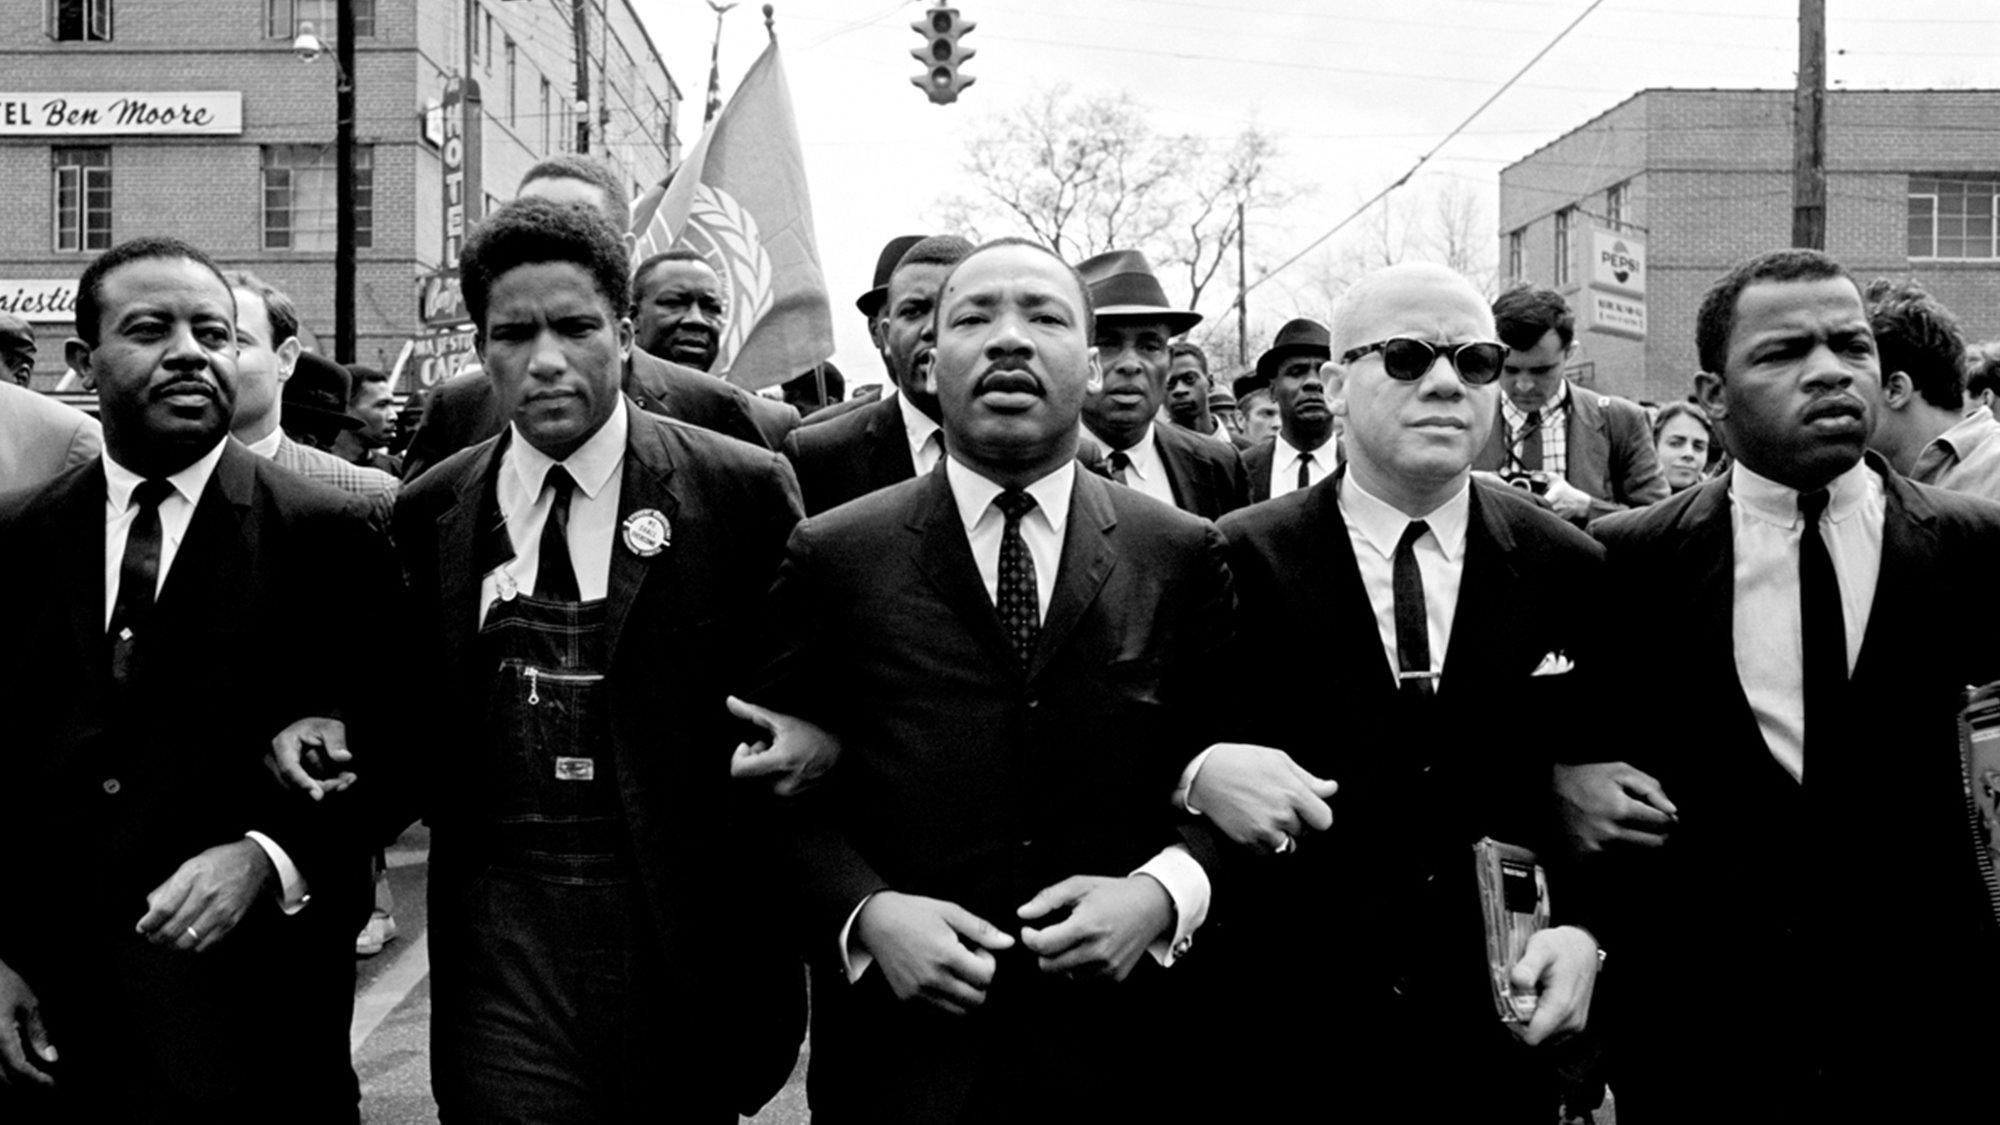 Je suis Martin Luther King Jr.